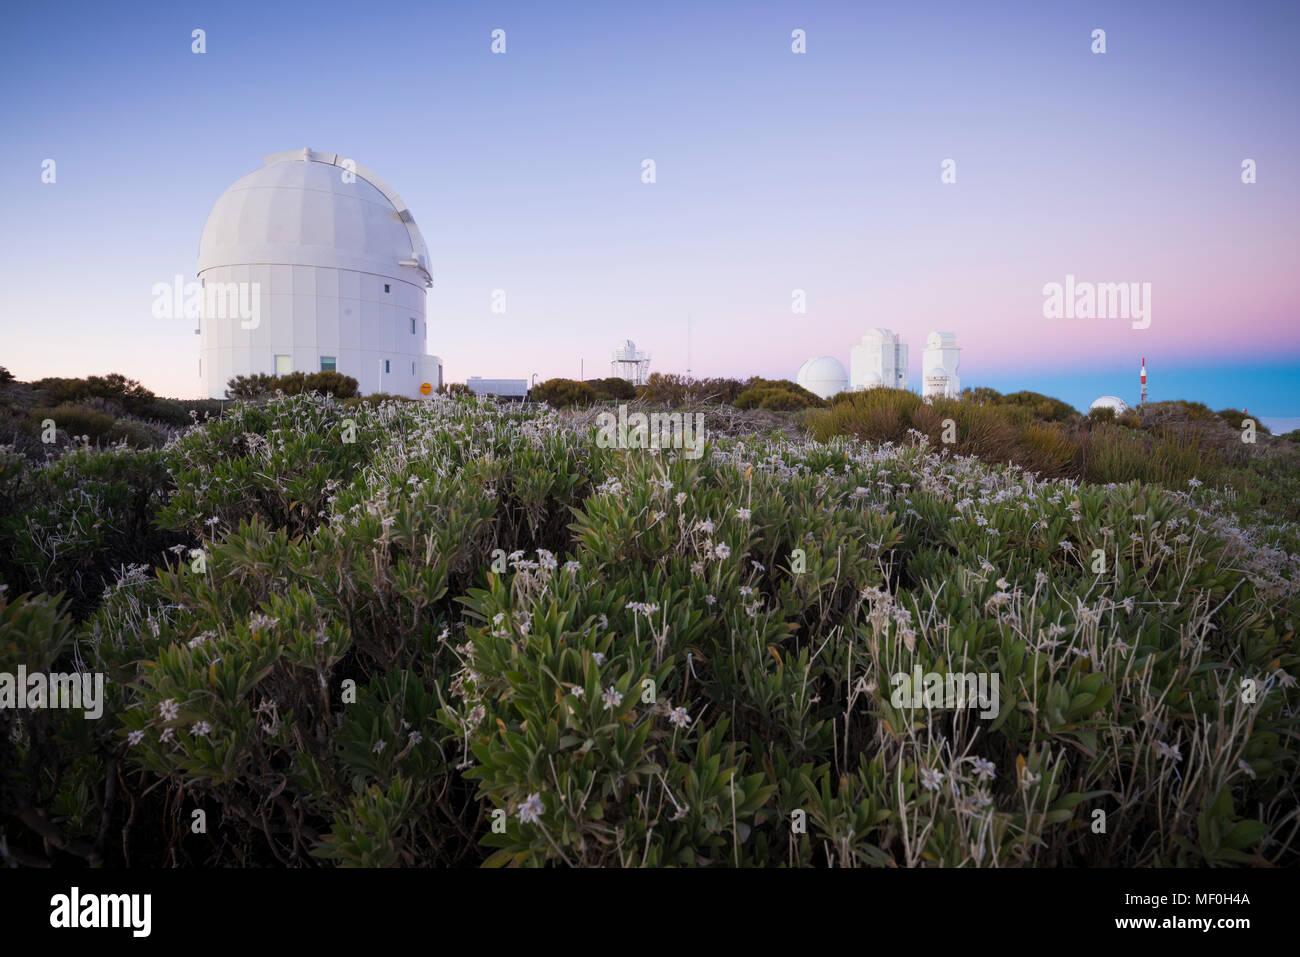 Spanien, Kanarische Inseln, Teneriffa, Teide Observatorium Stockbild